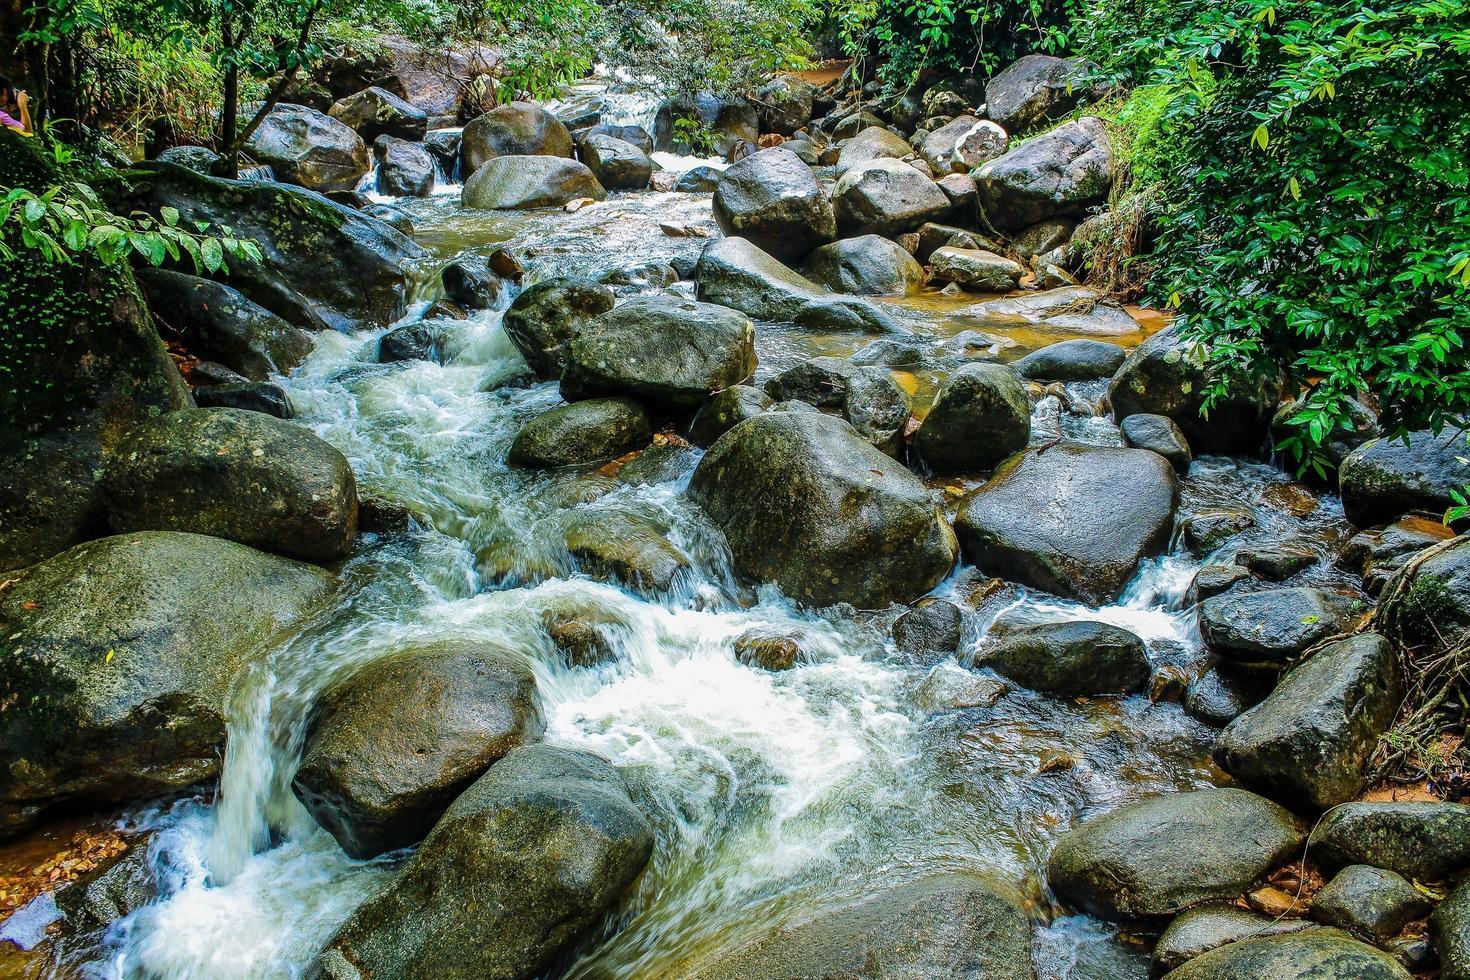 Phlio cascata in chanthaburi thailandia foto